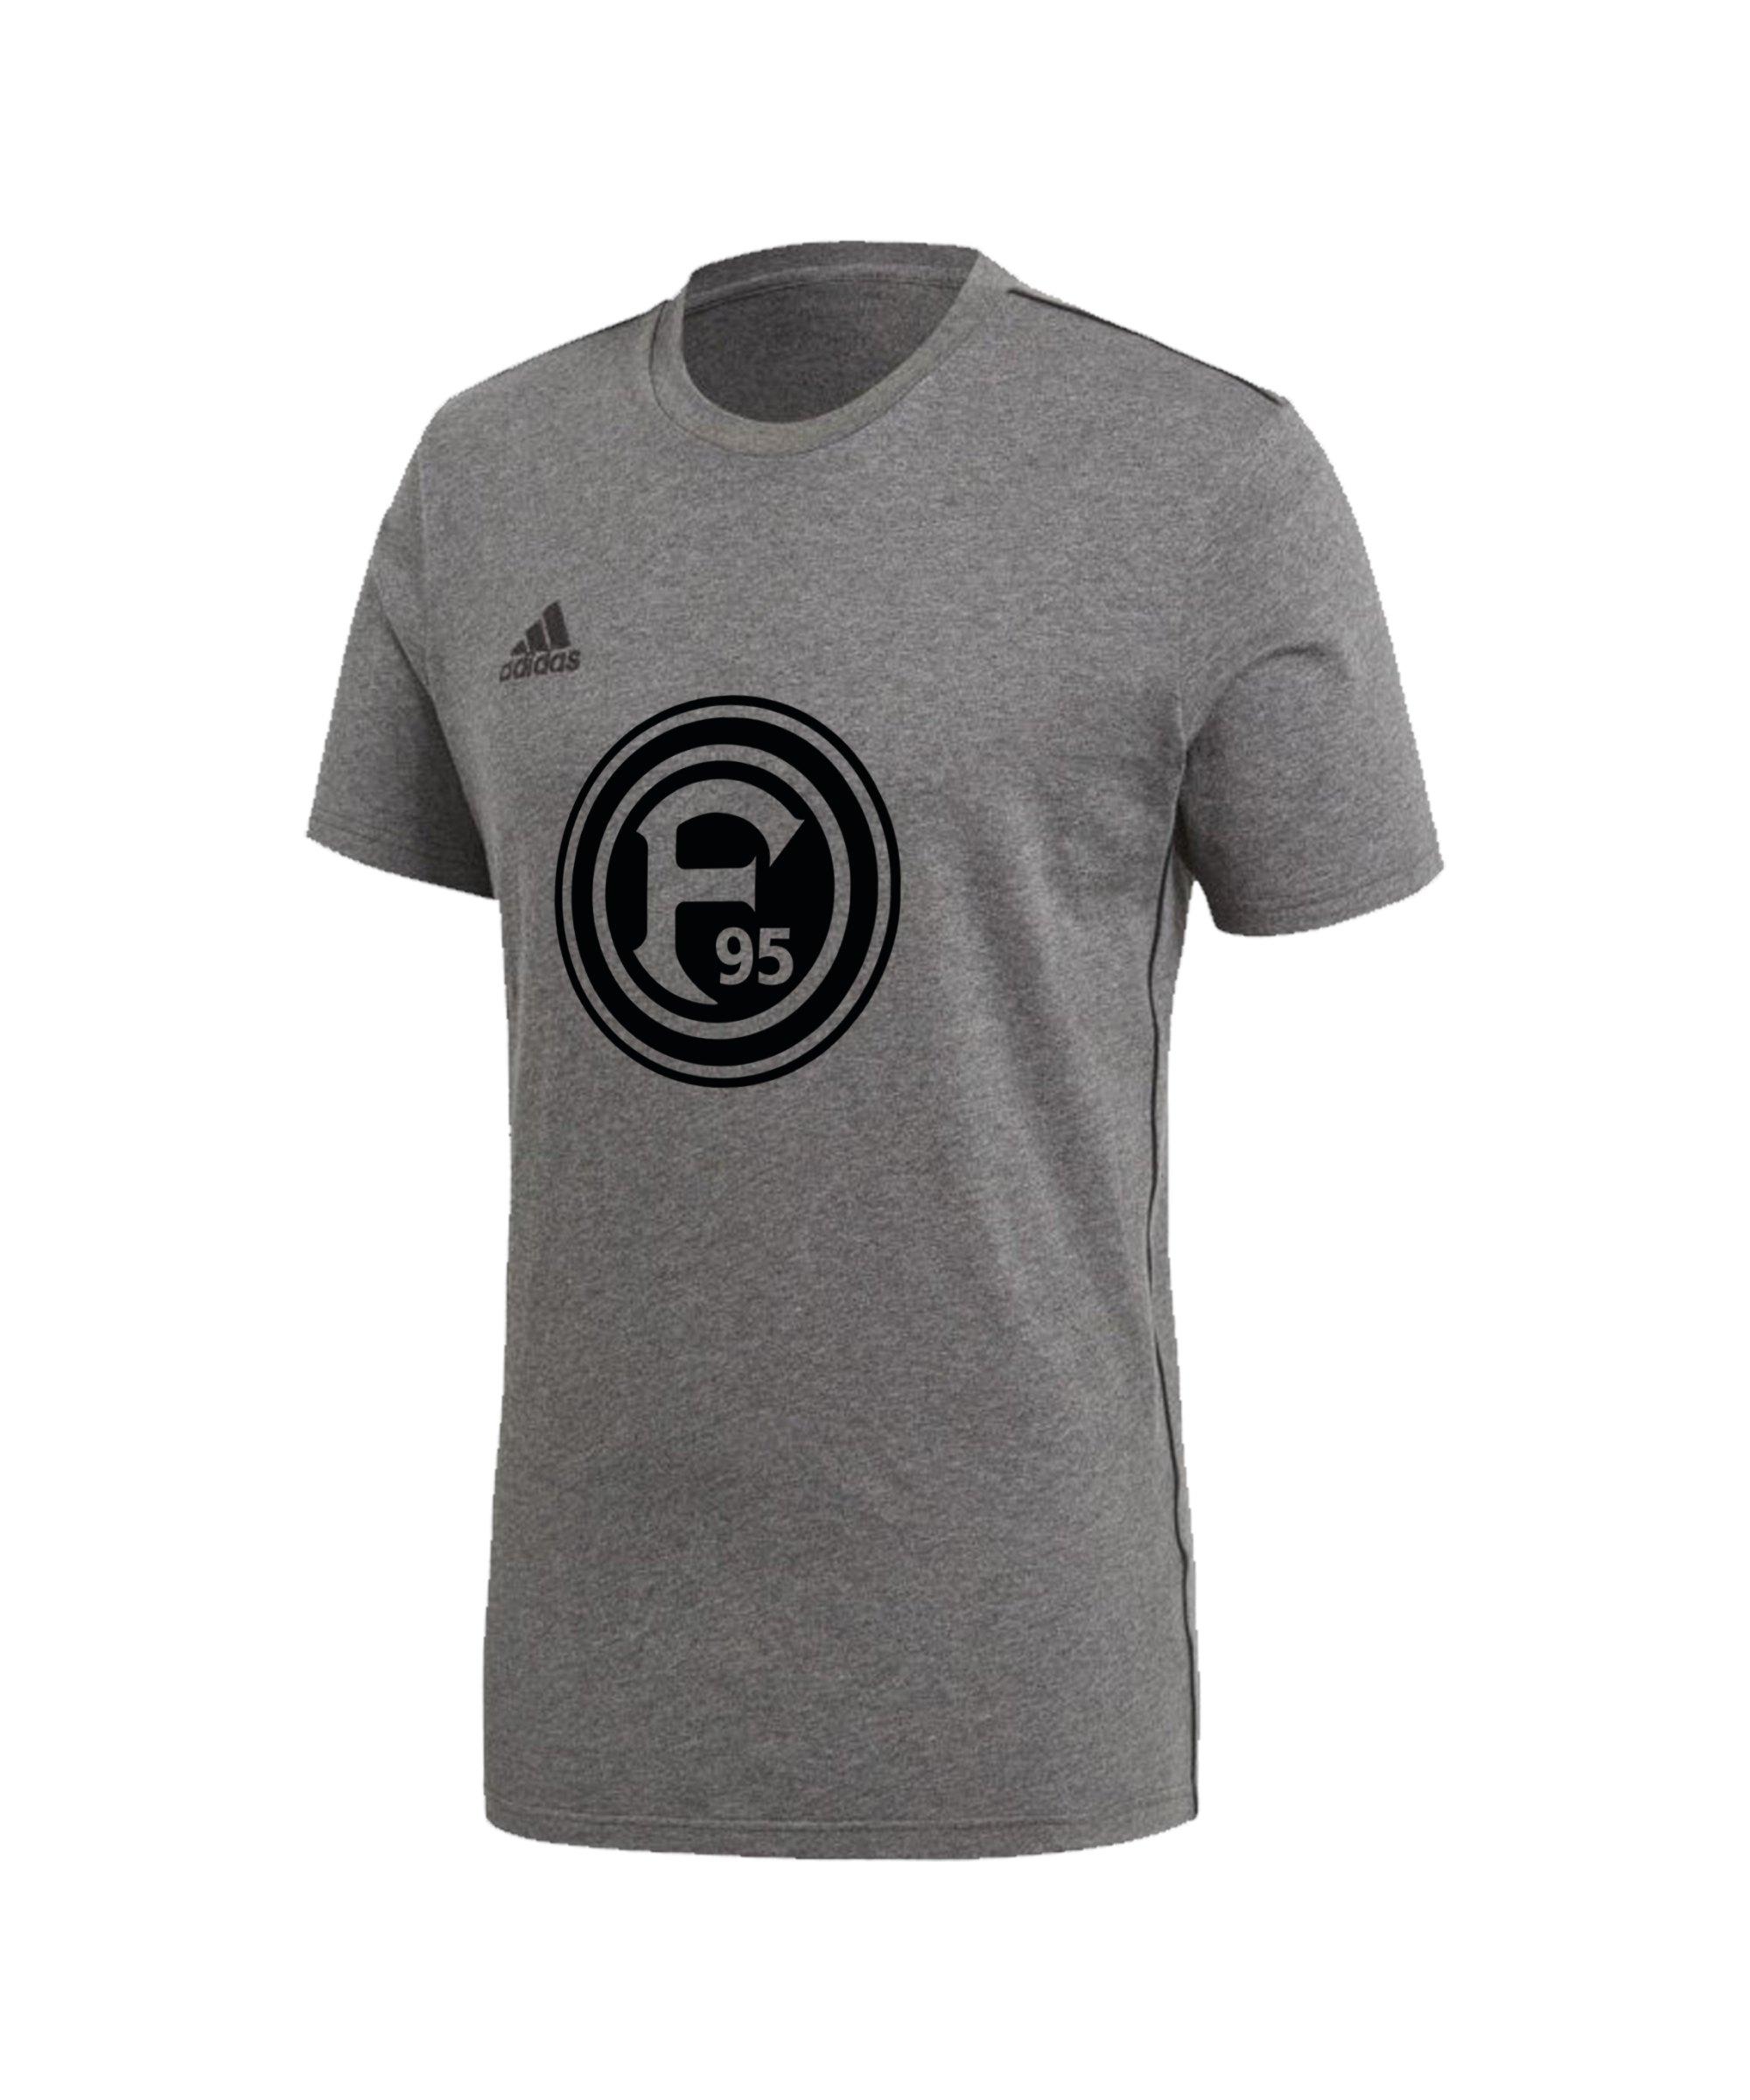 adidas Fortuna Düsseldorf Freizeit T-Shirt Kids Grau - grau